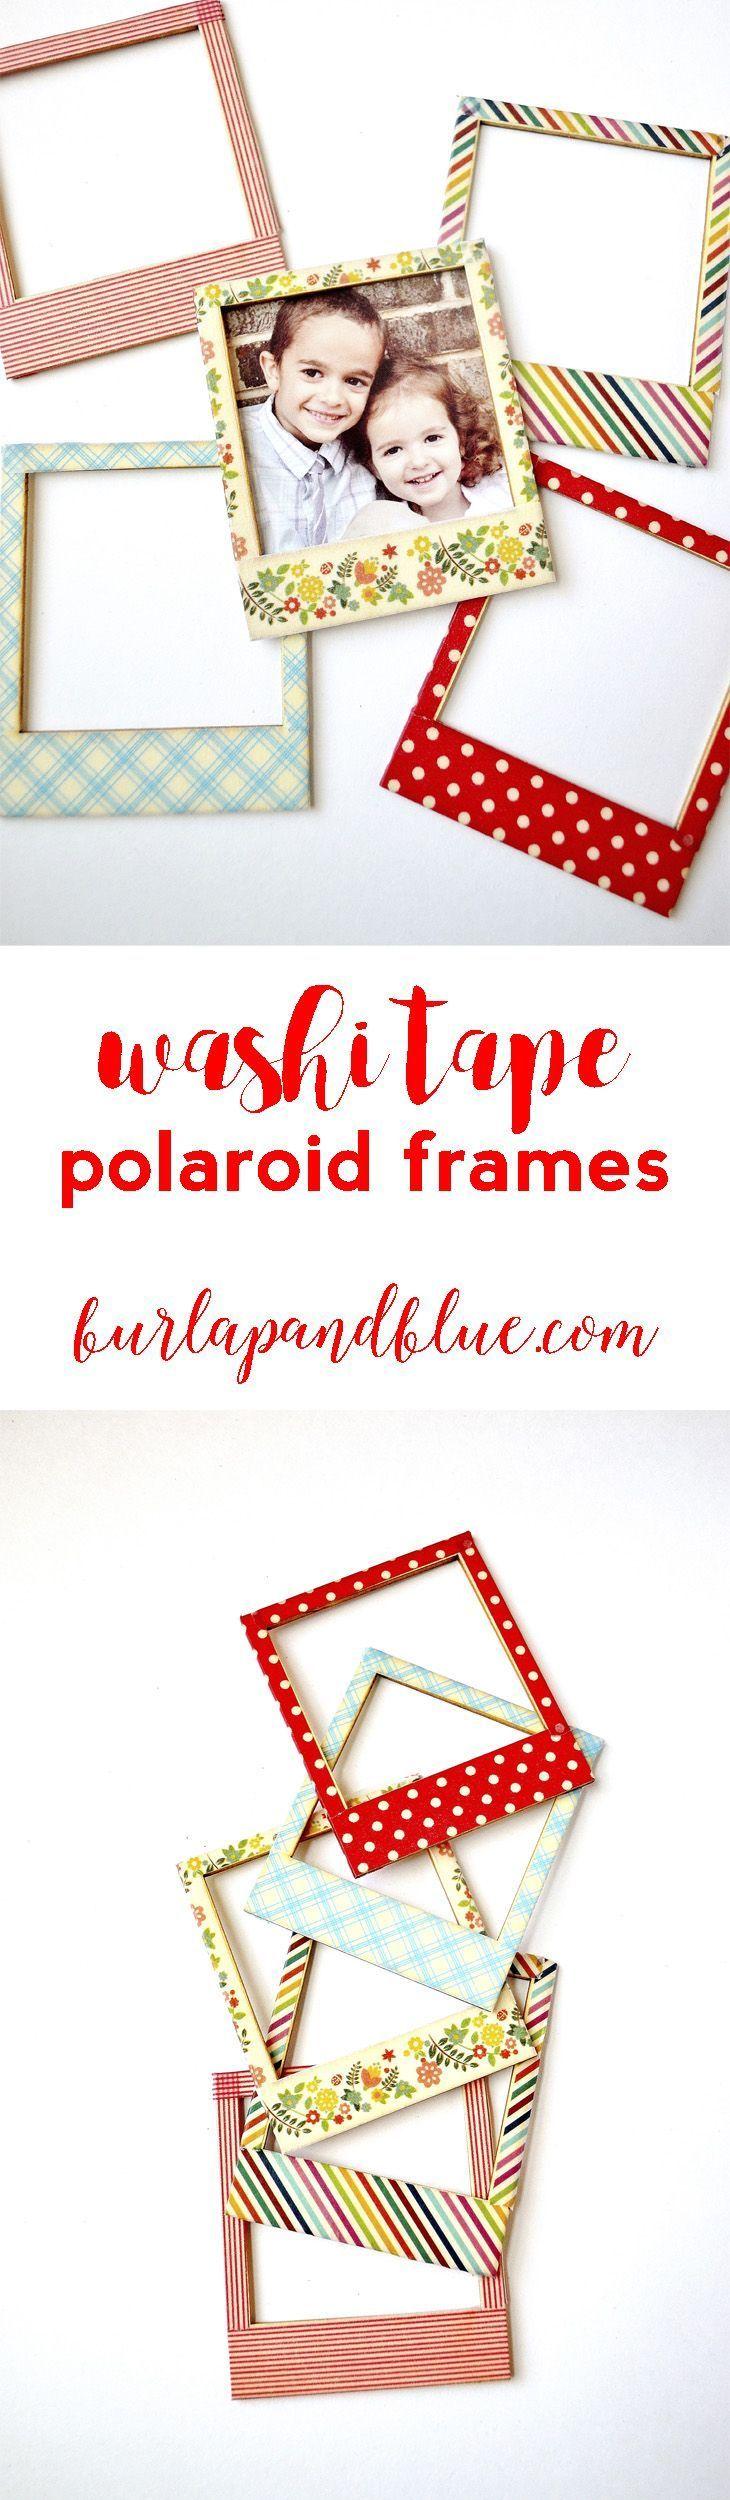 Washi Tape Polaroid Frames An Easy Gift Idea Just Add A Magnet